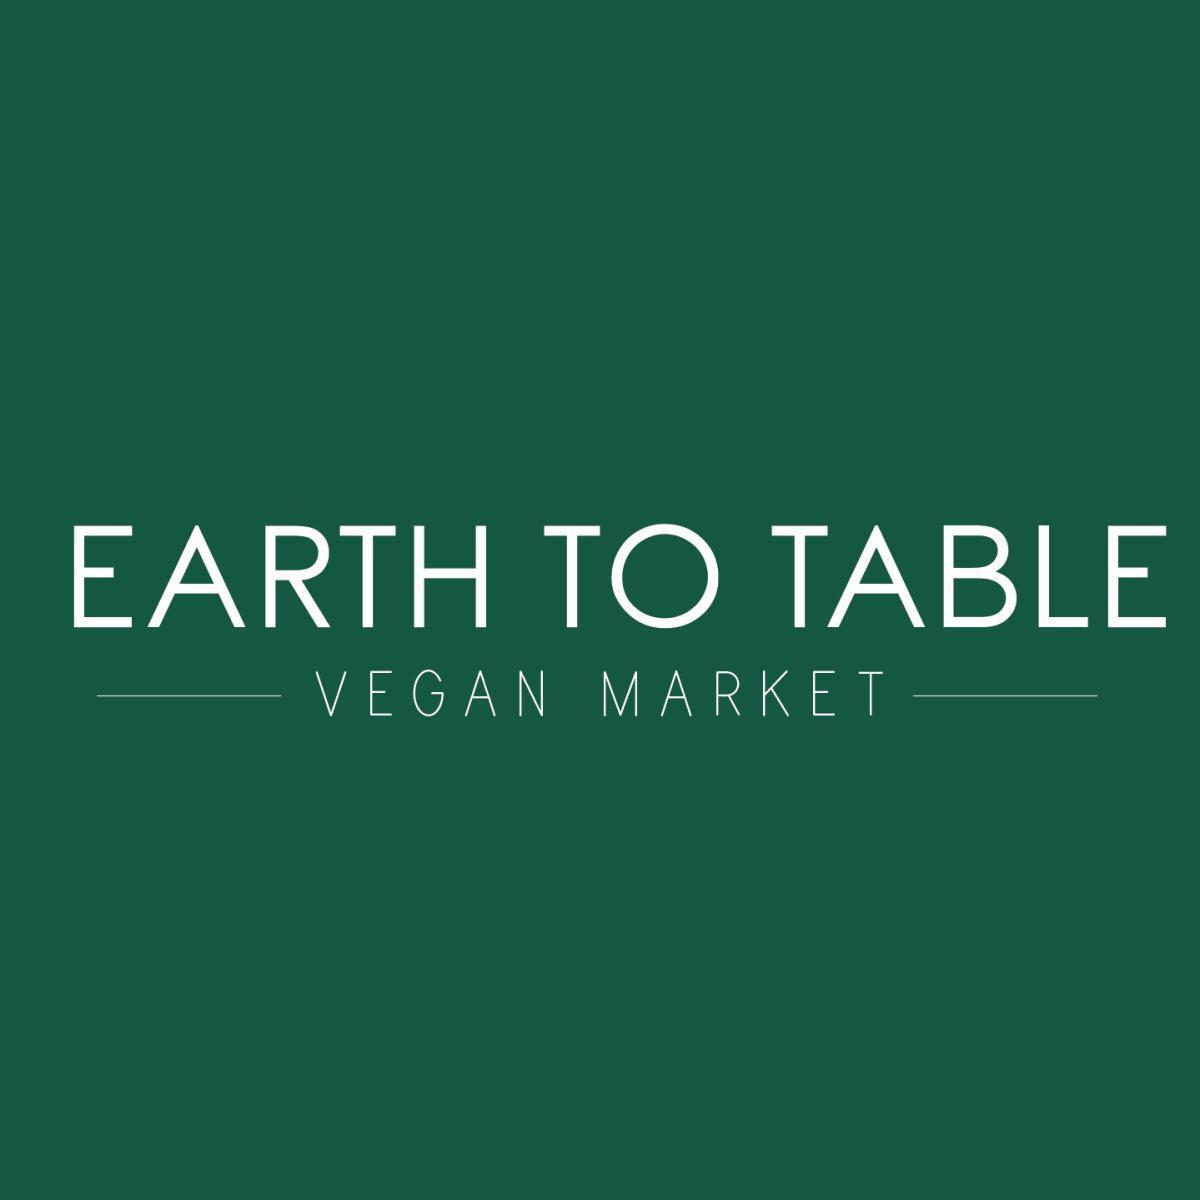 Earth to Table Vegan Market